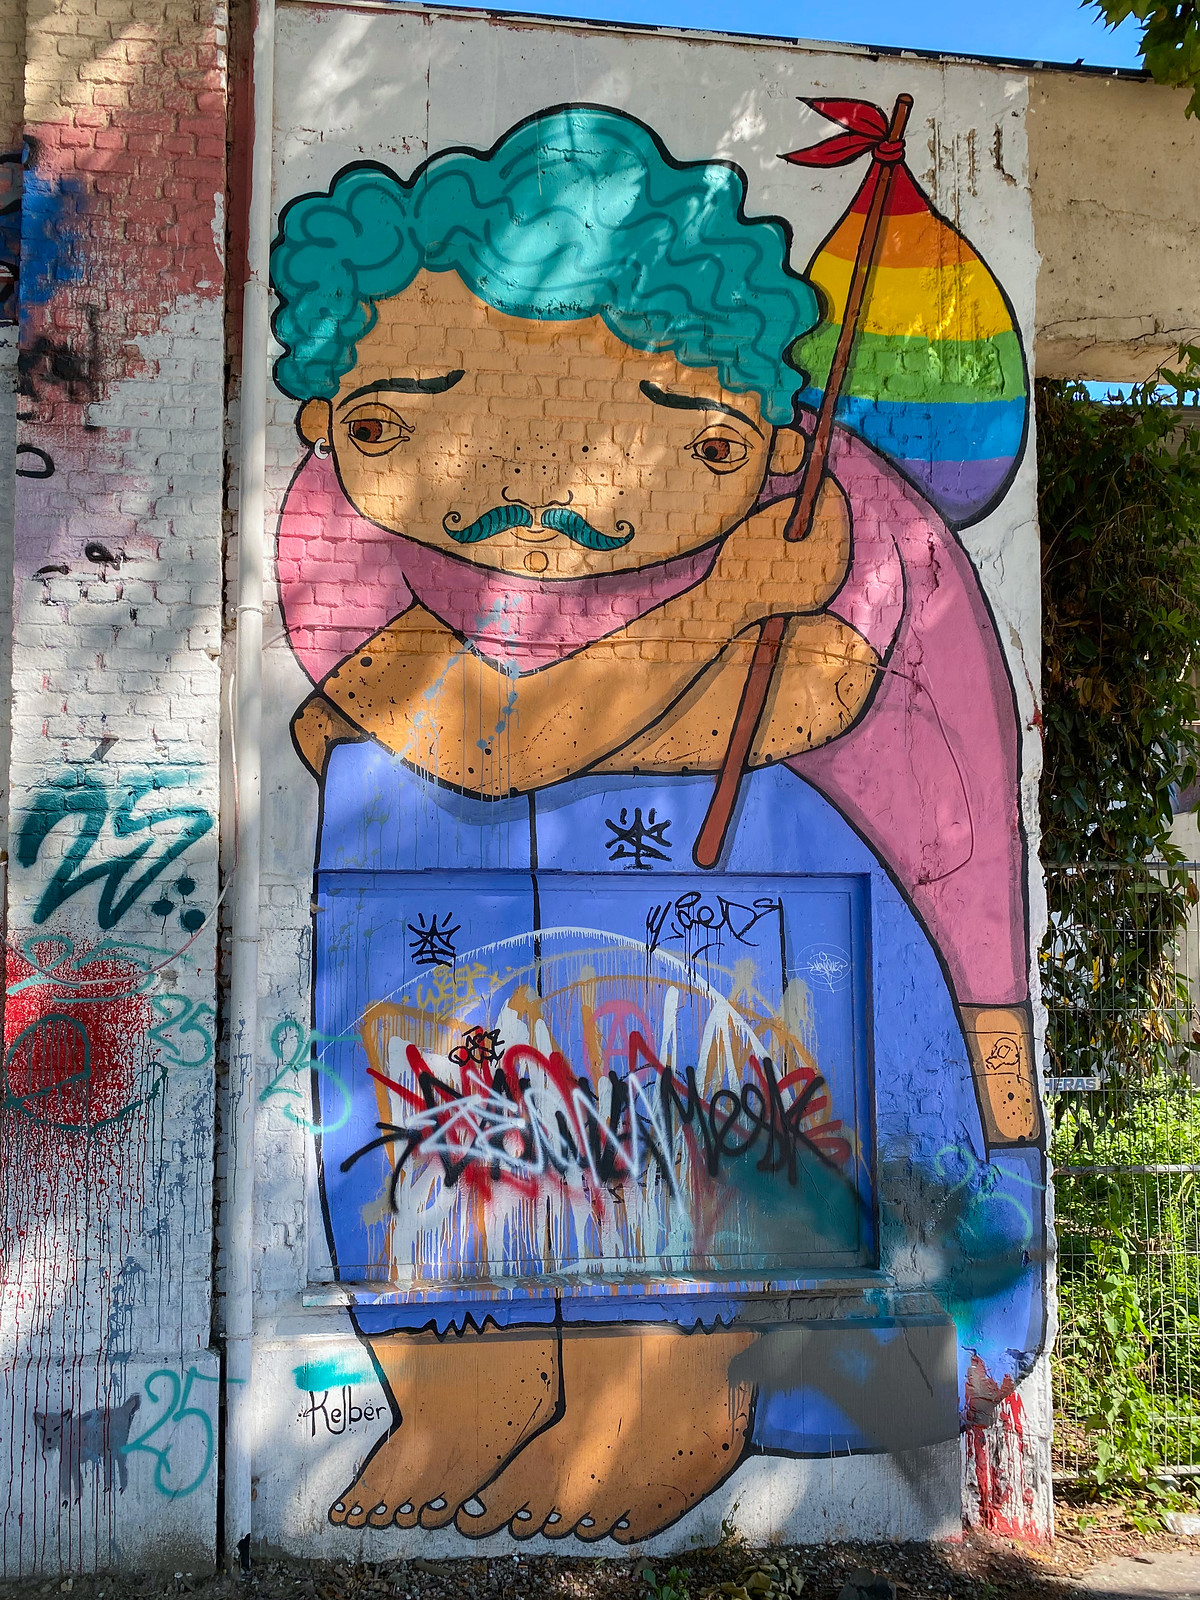 Vagabond street art by Kelber